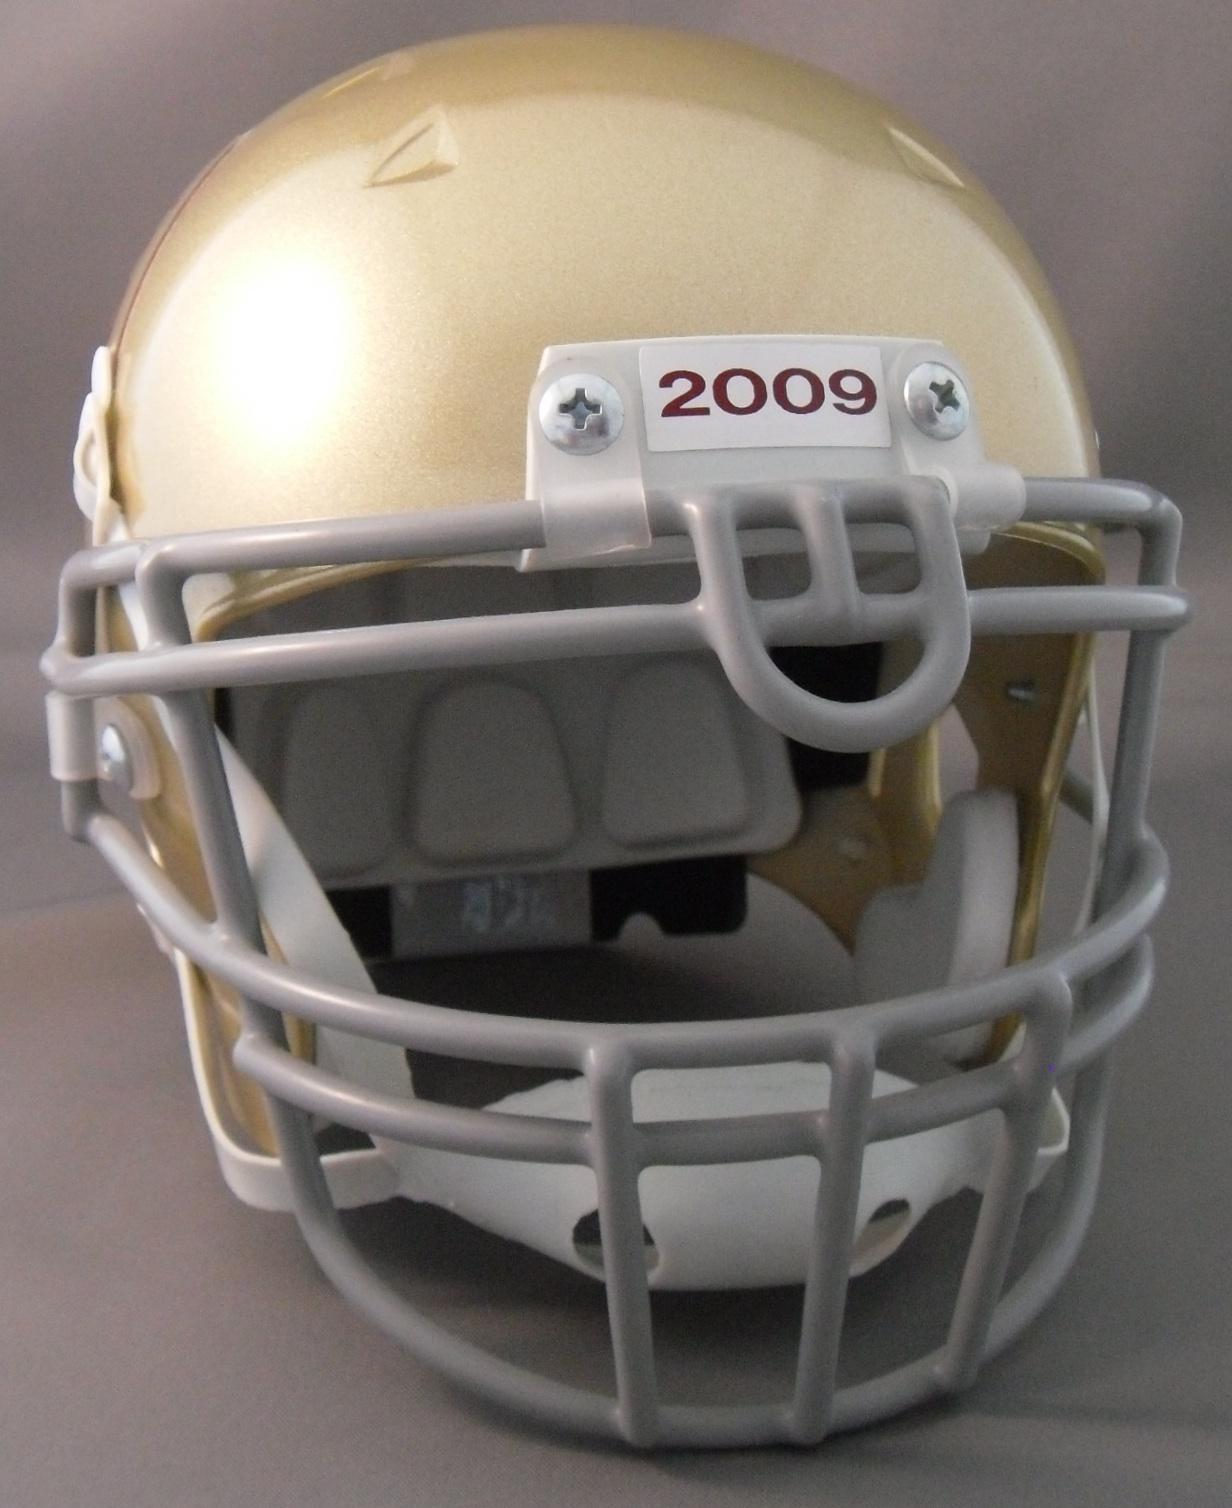 Football Helmet Front View : Helmetnation february